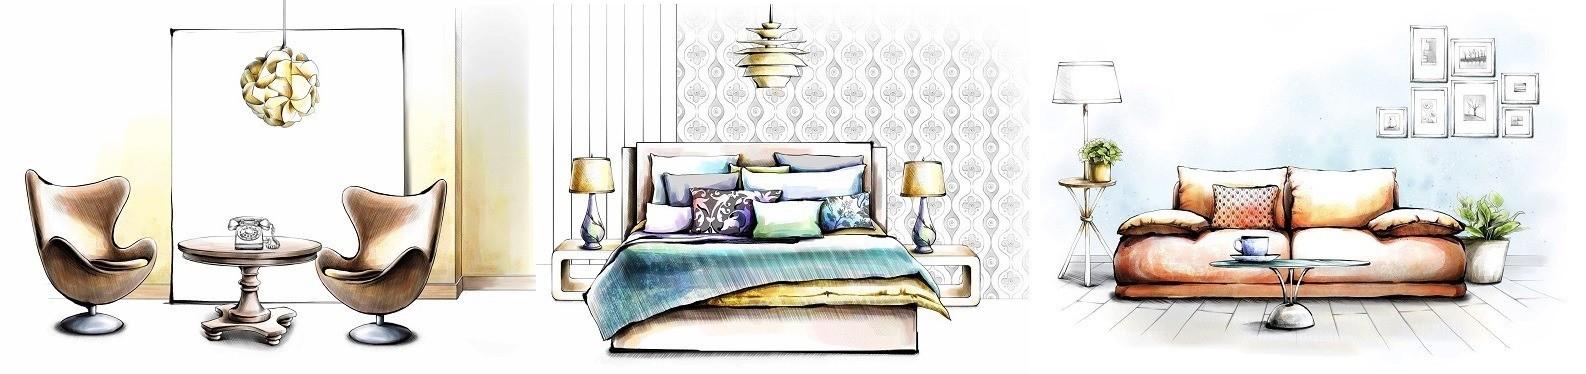 Sofa dizayn.zakazat - Фиолетовый диван на заказ